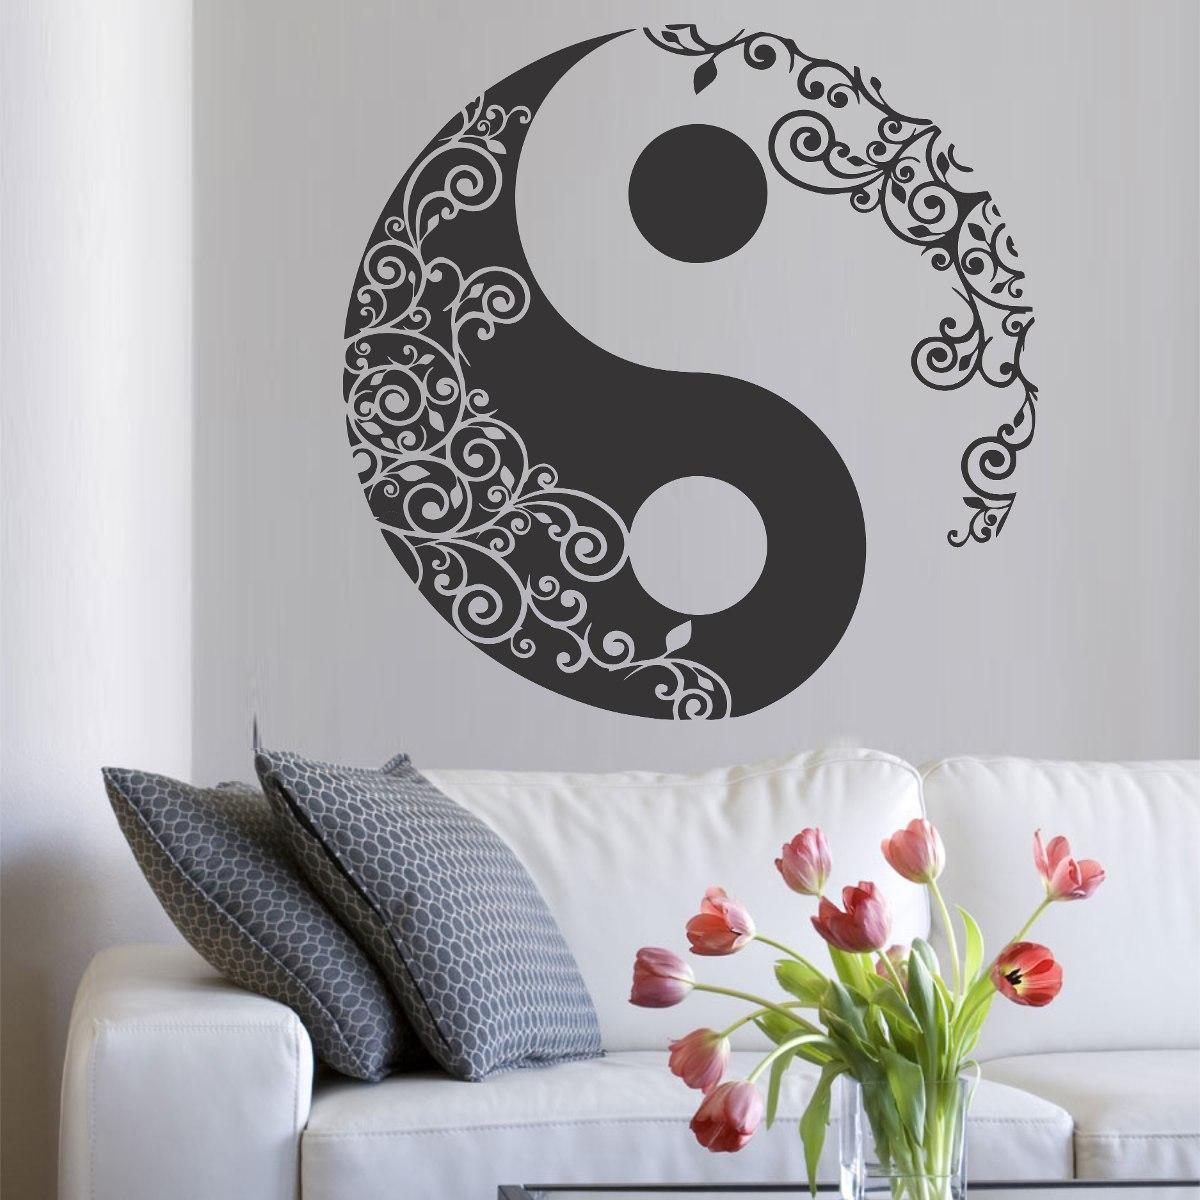 Adesivo Decorativo De Parede Mandalas 1x1metro R$ 69,90